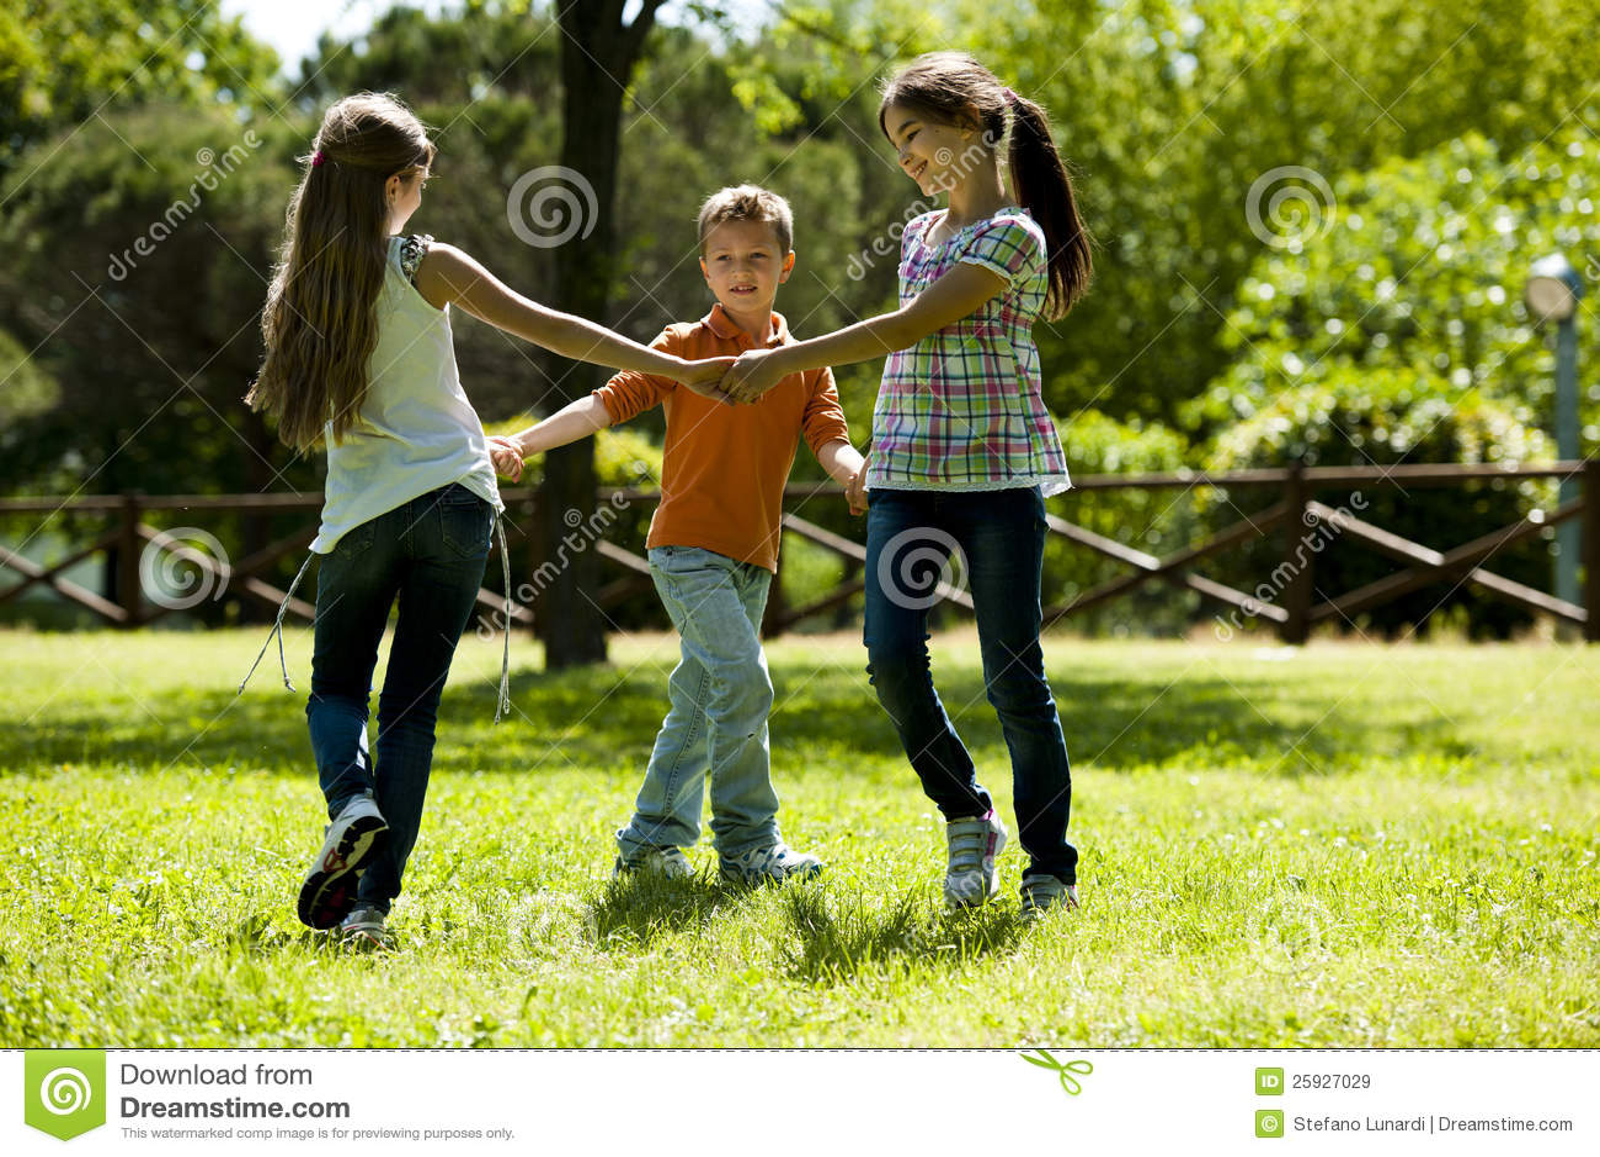 Kids Playing Ring Around The Rosey